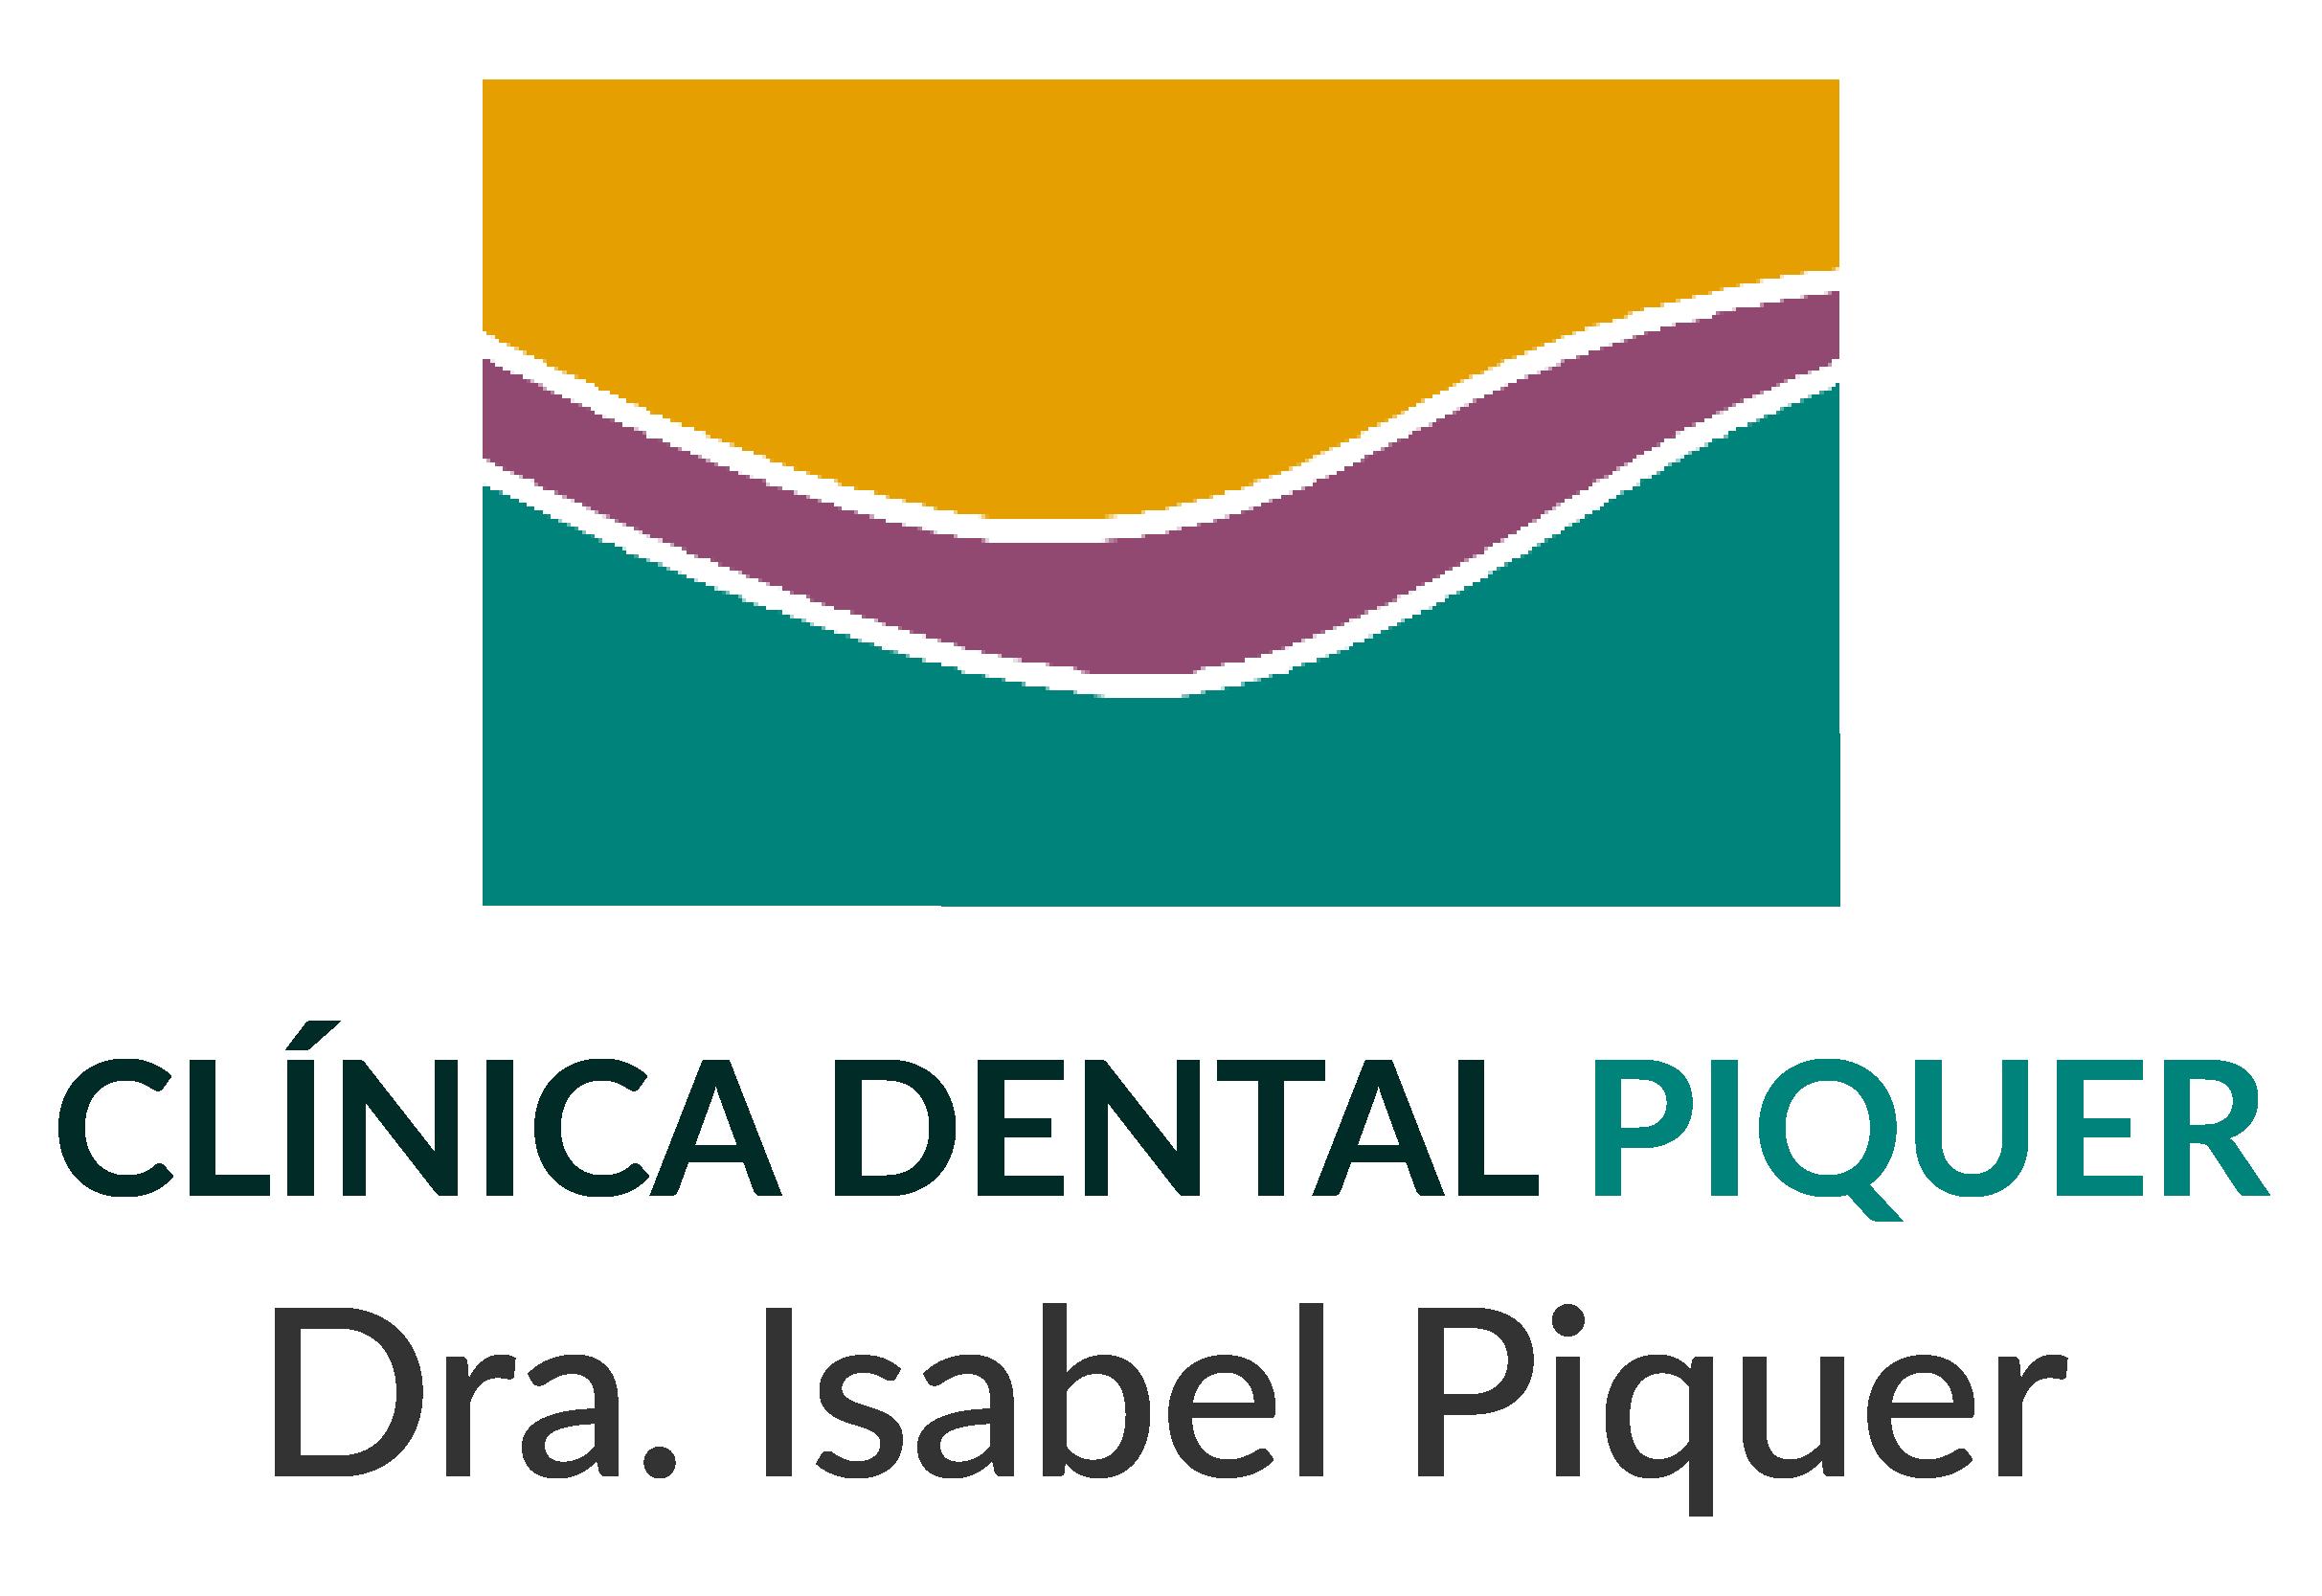 Clínica dental Piquer